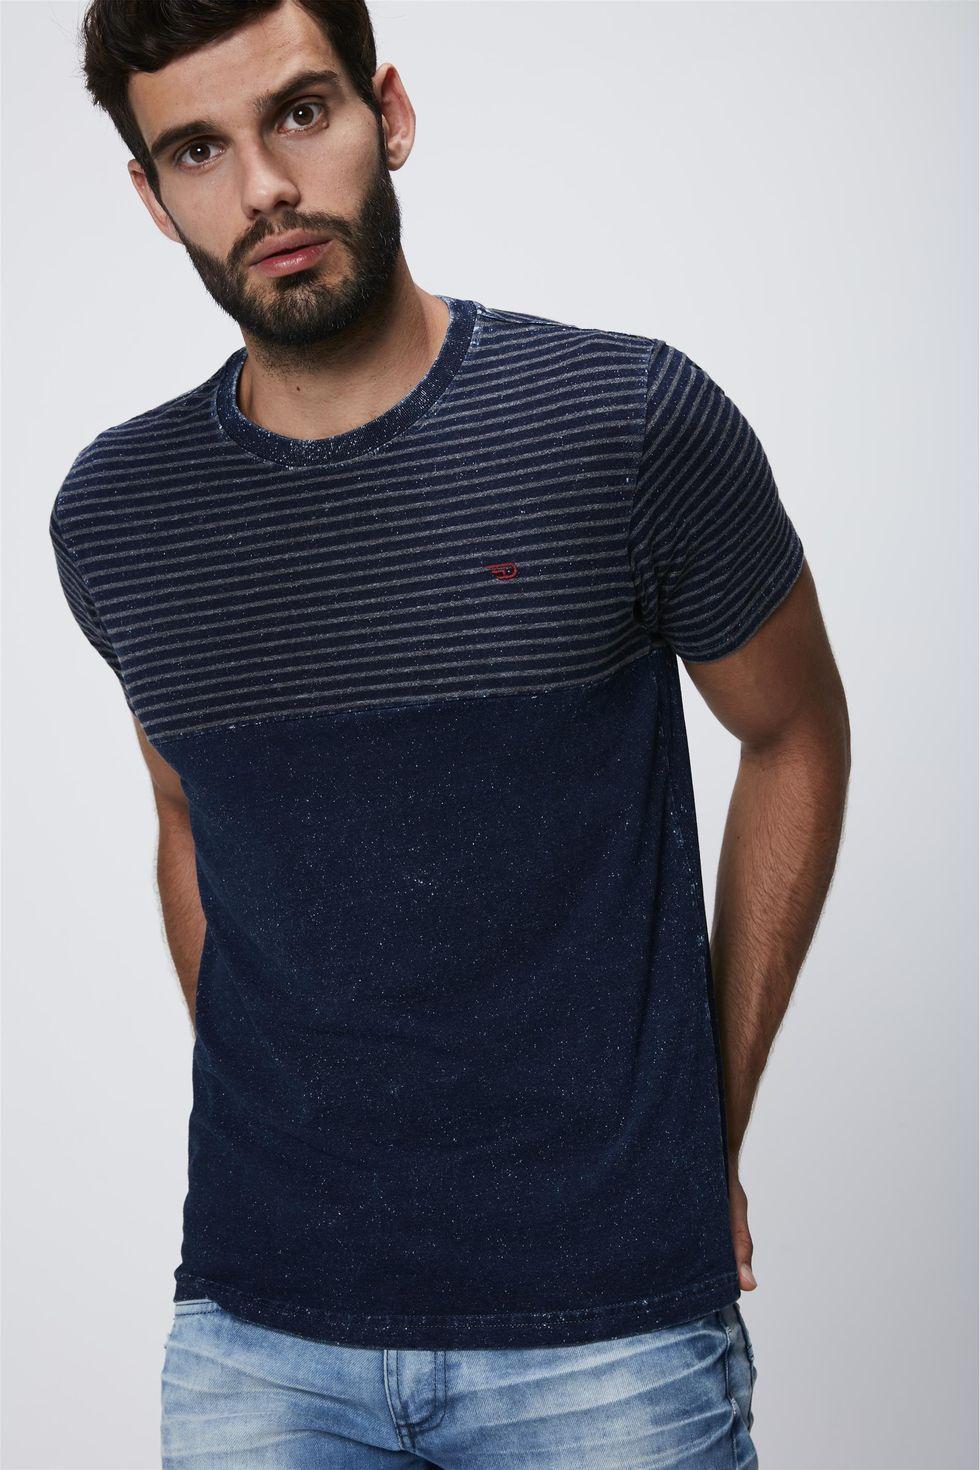 Camiseta-Masculina-em-Malha-Denim-Frente--